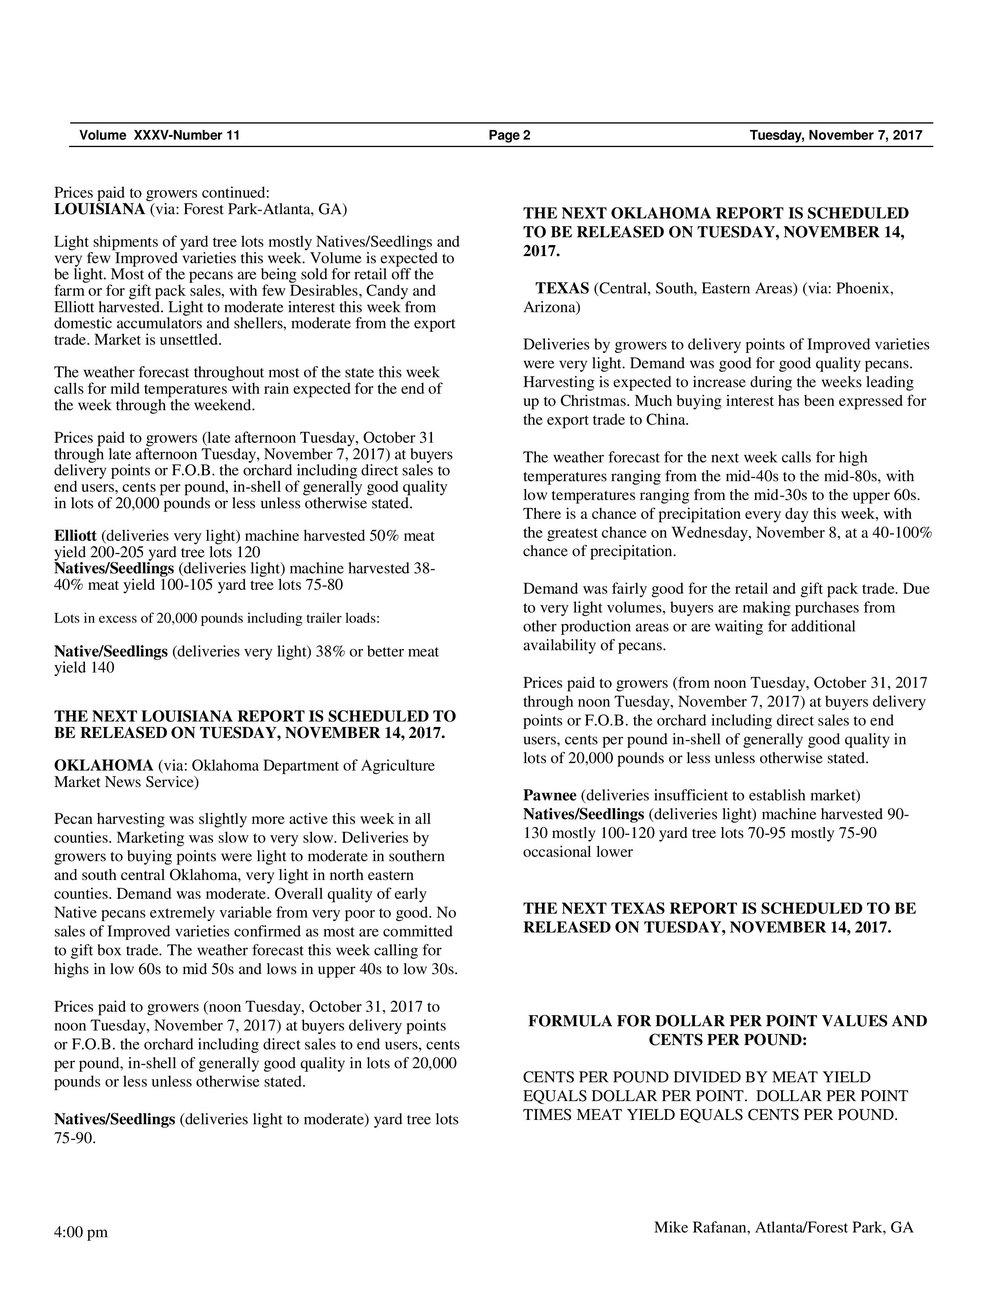 USDA Pecan Report 11-7-17-page-002.jpg